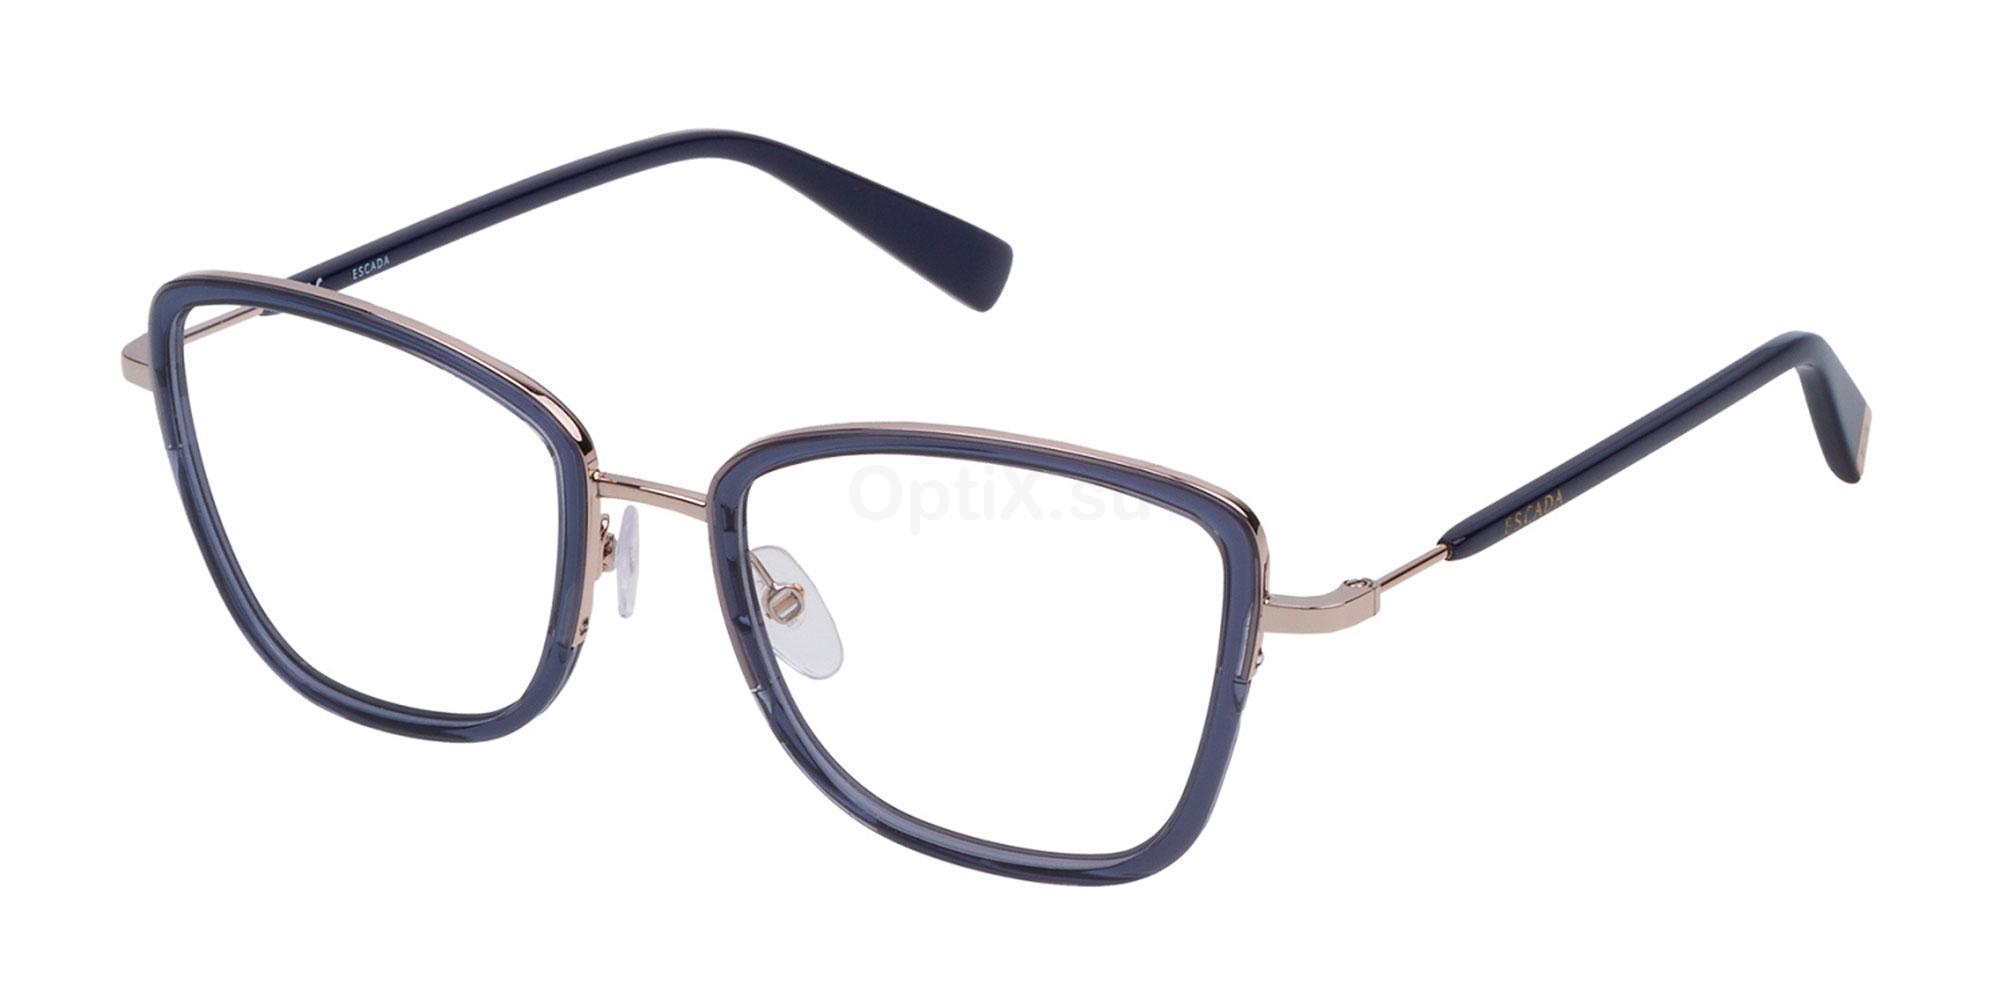 0892 VES947 Glasses, Escada